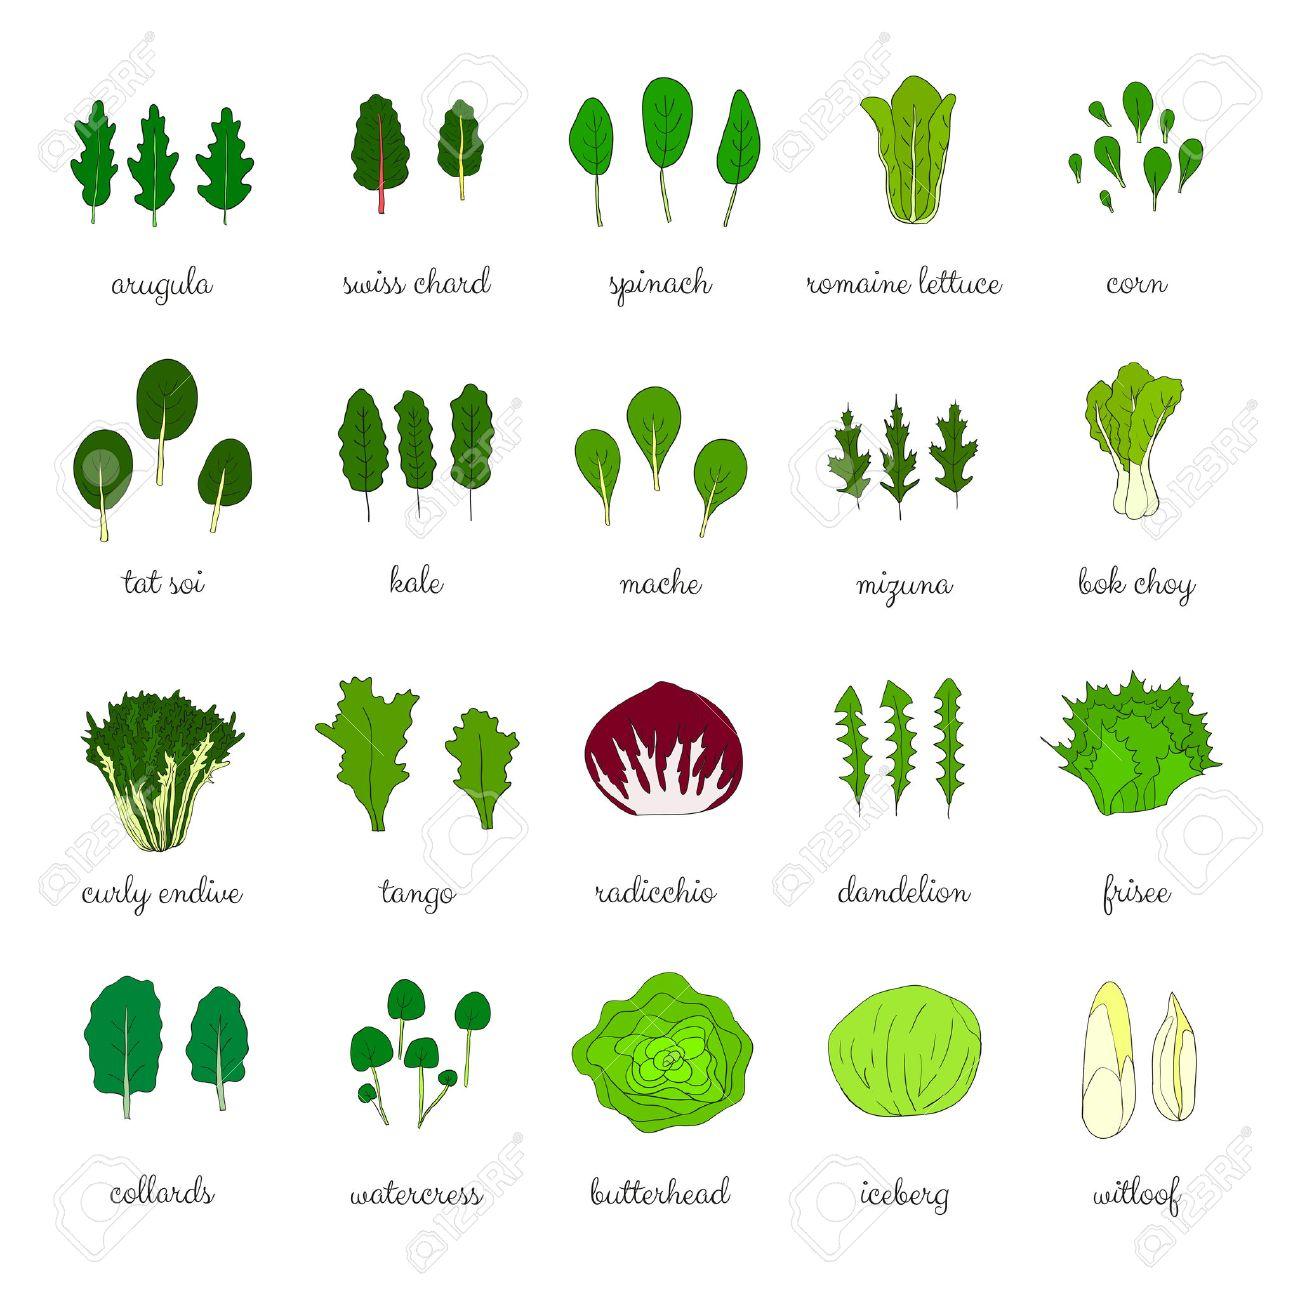 Image result for leafy greens